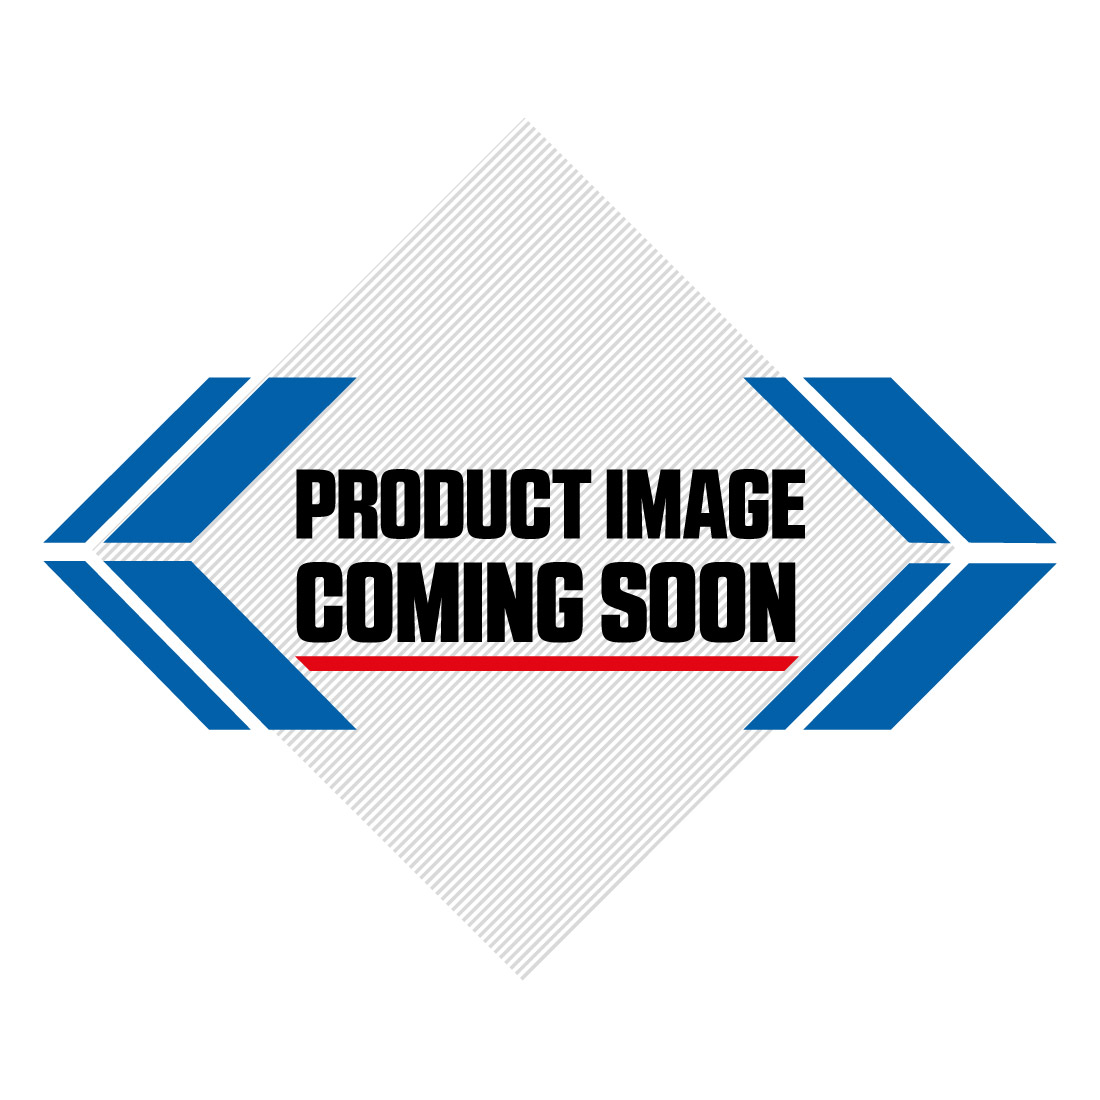 Suzuki Plastic Kit RMZ 450 (11-12) OEM Factory Image-1